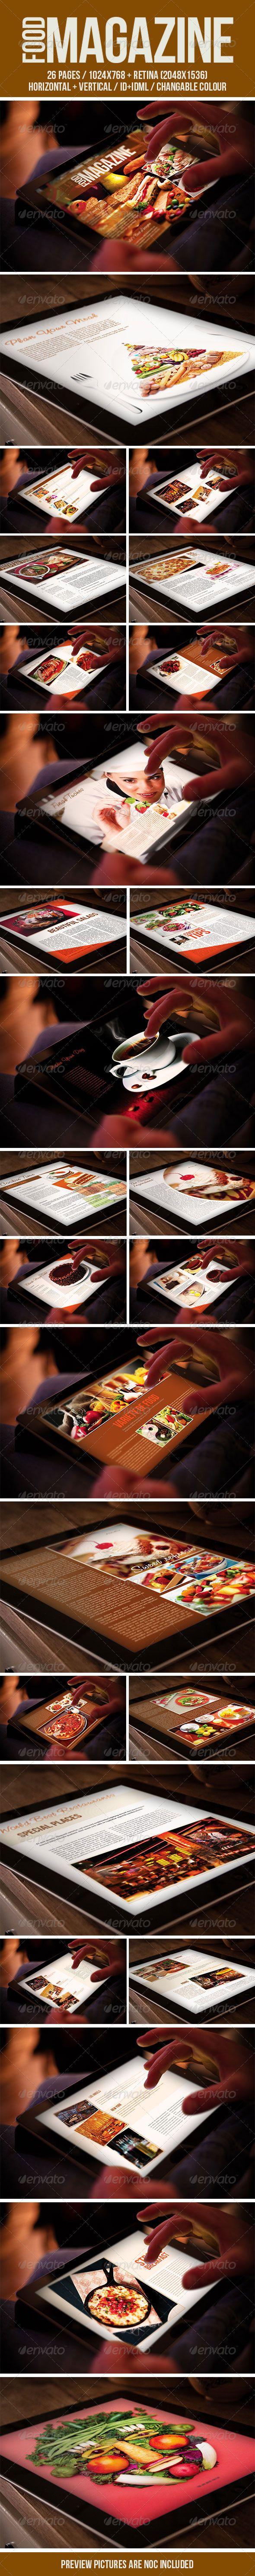 Tablet Food Magazine Template